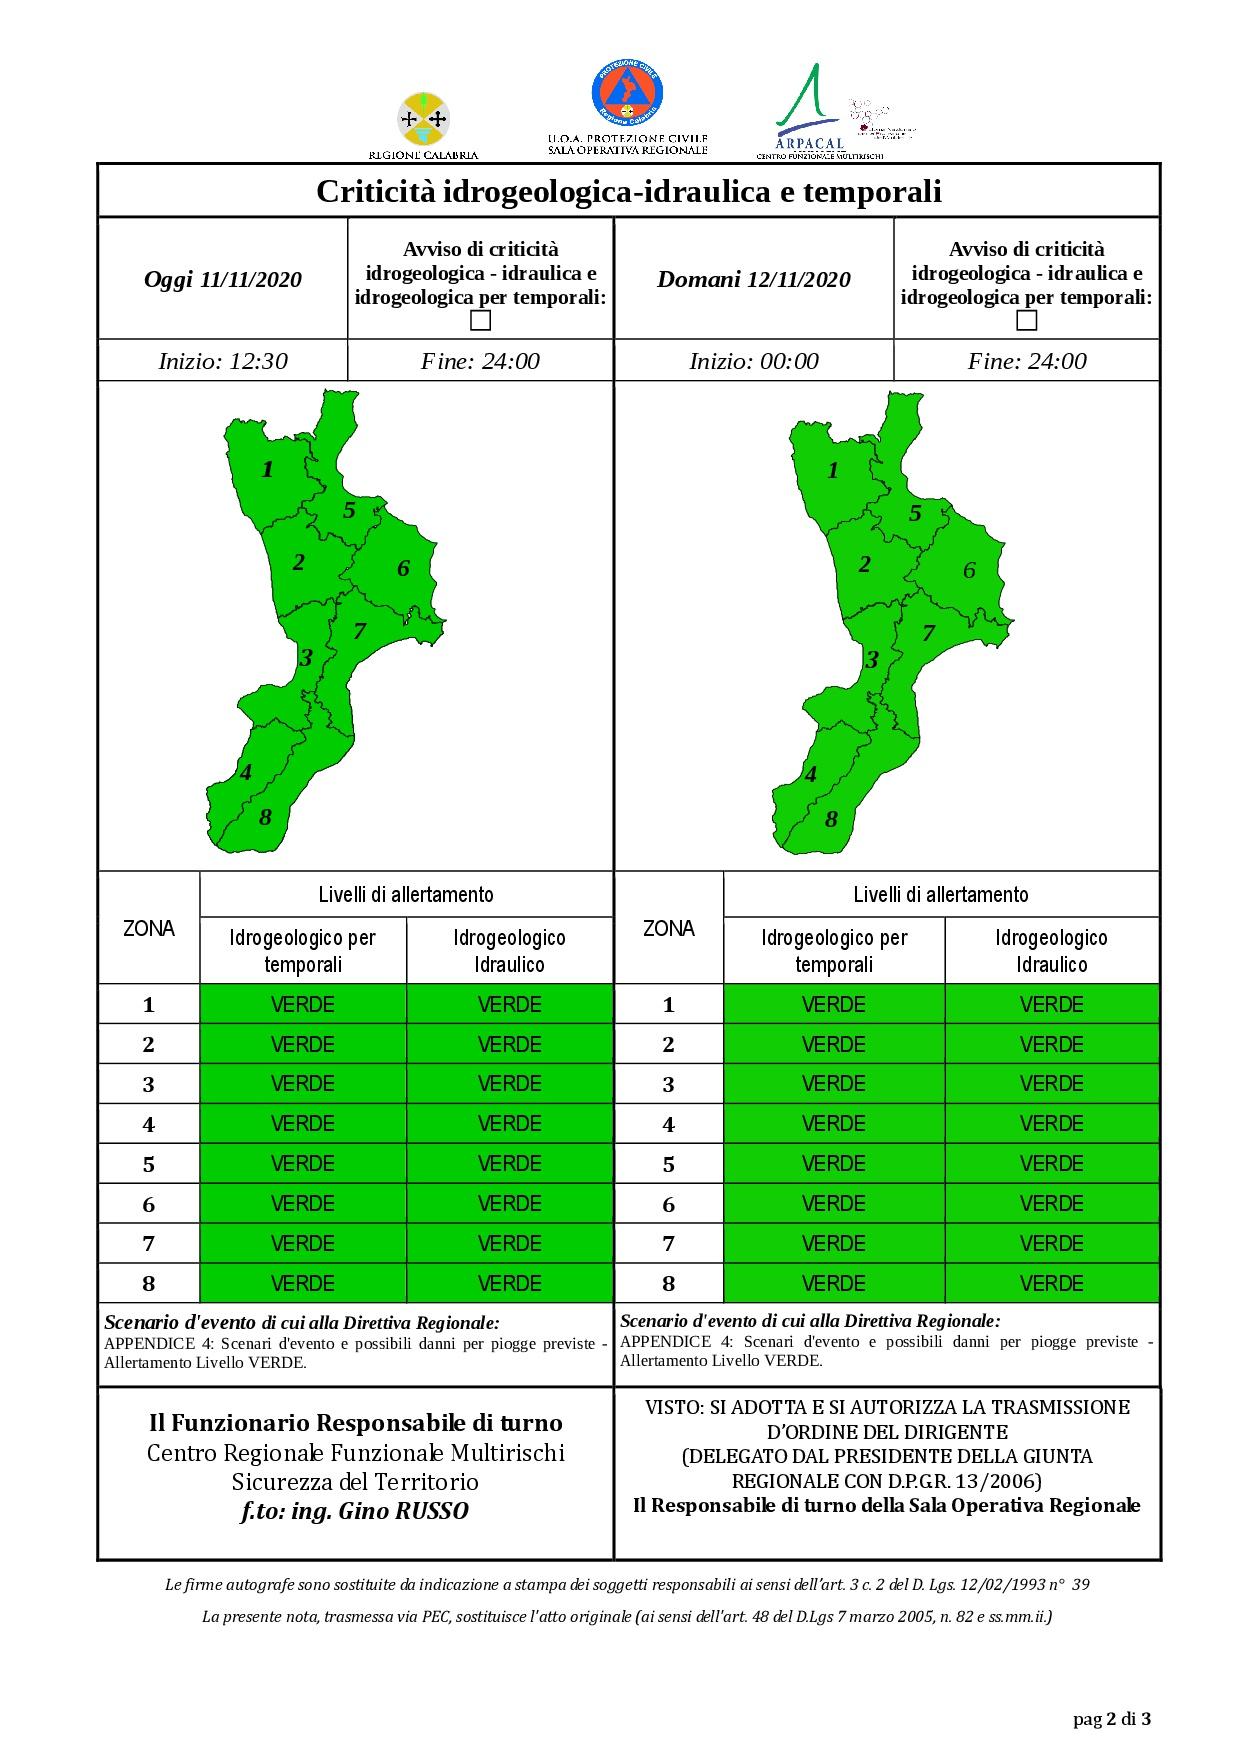 Criticità idrogeologica-idraulica e temporali in Calabria 11-11-2020